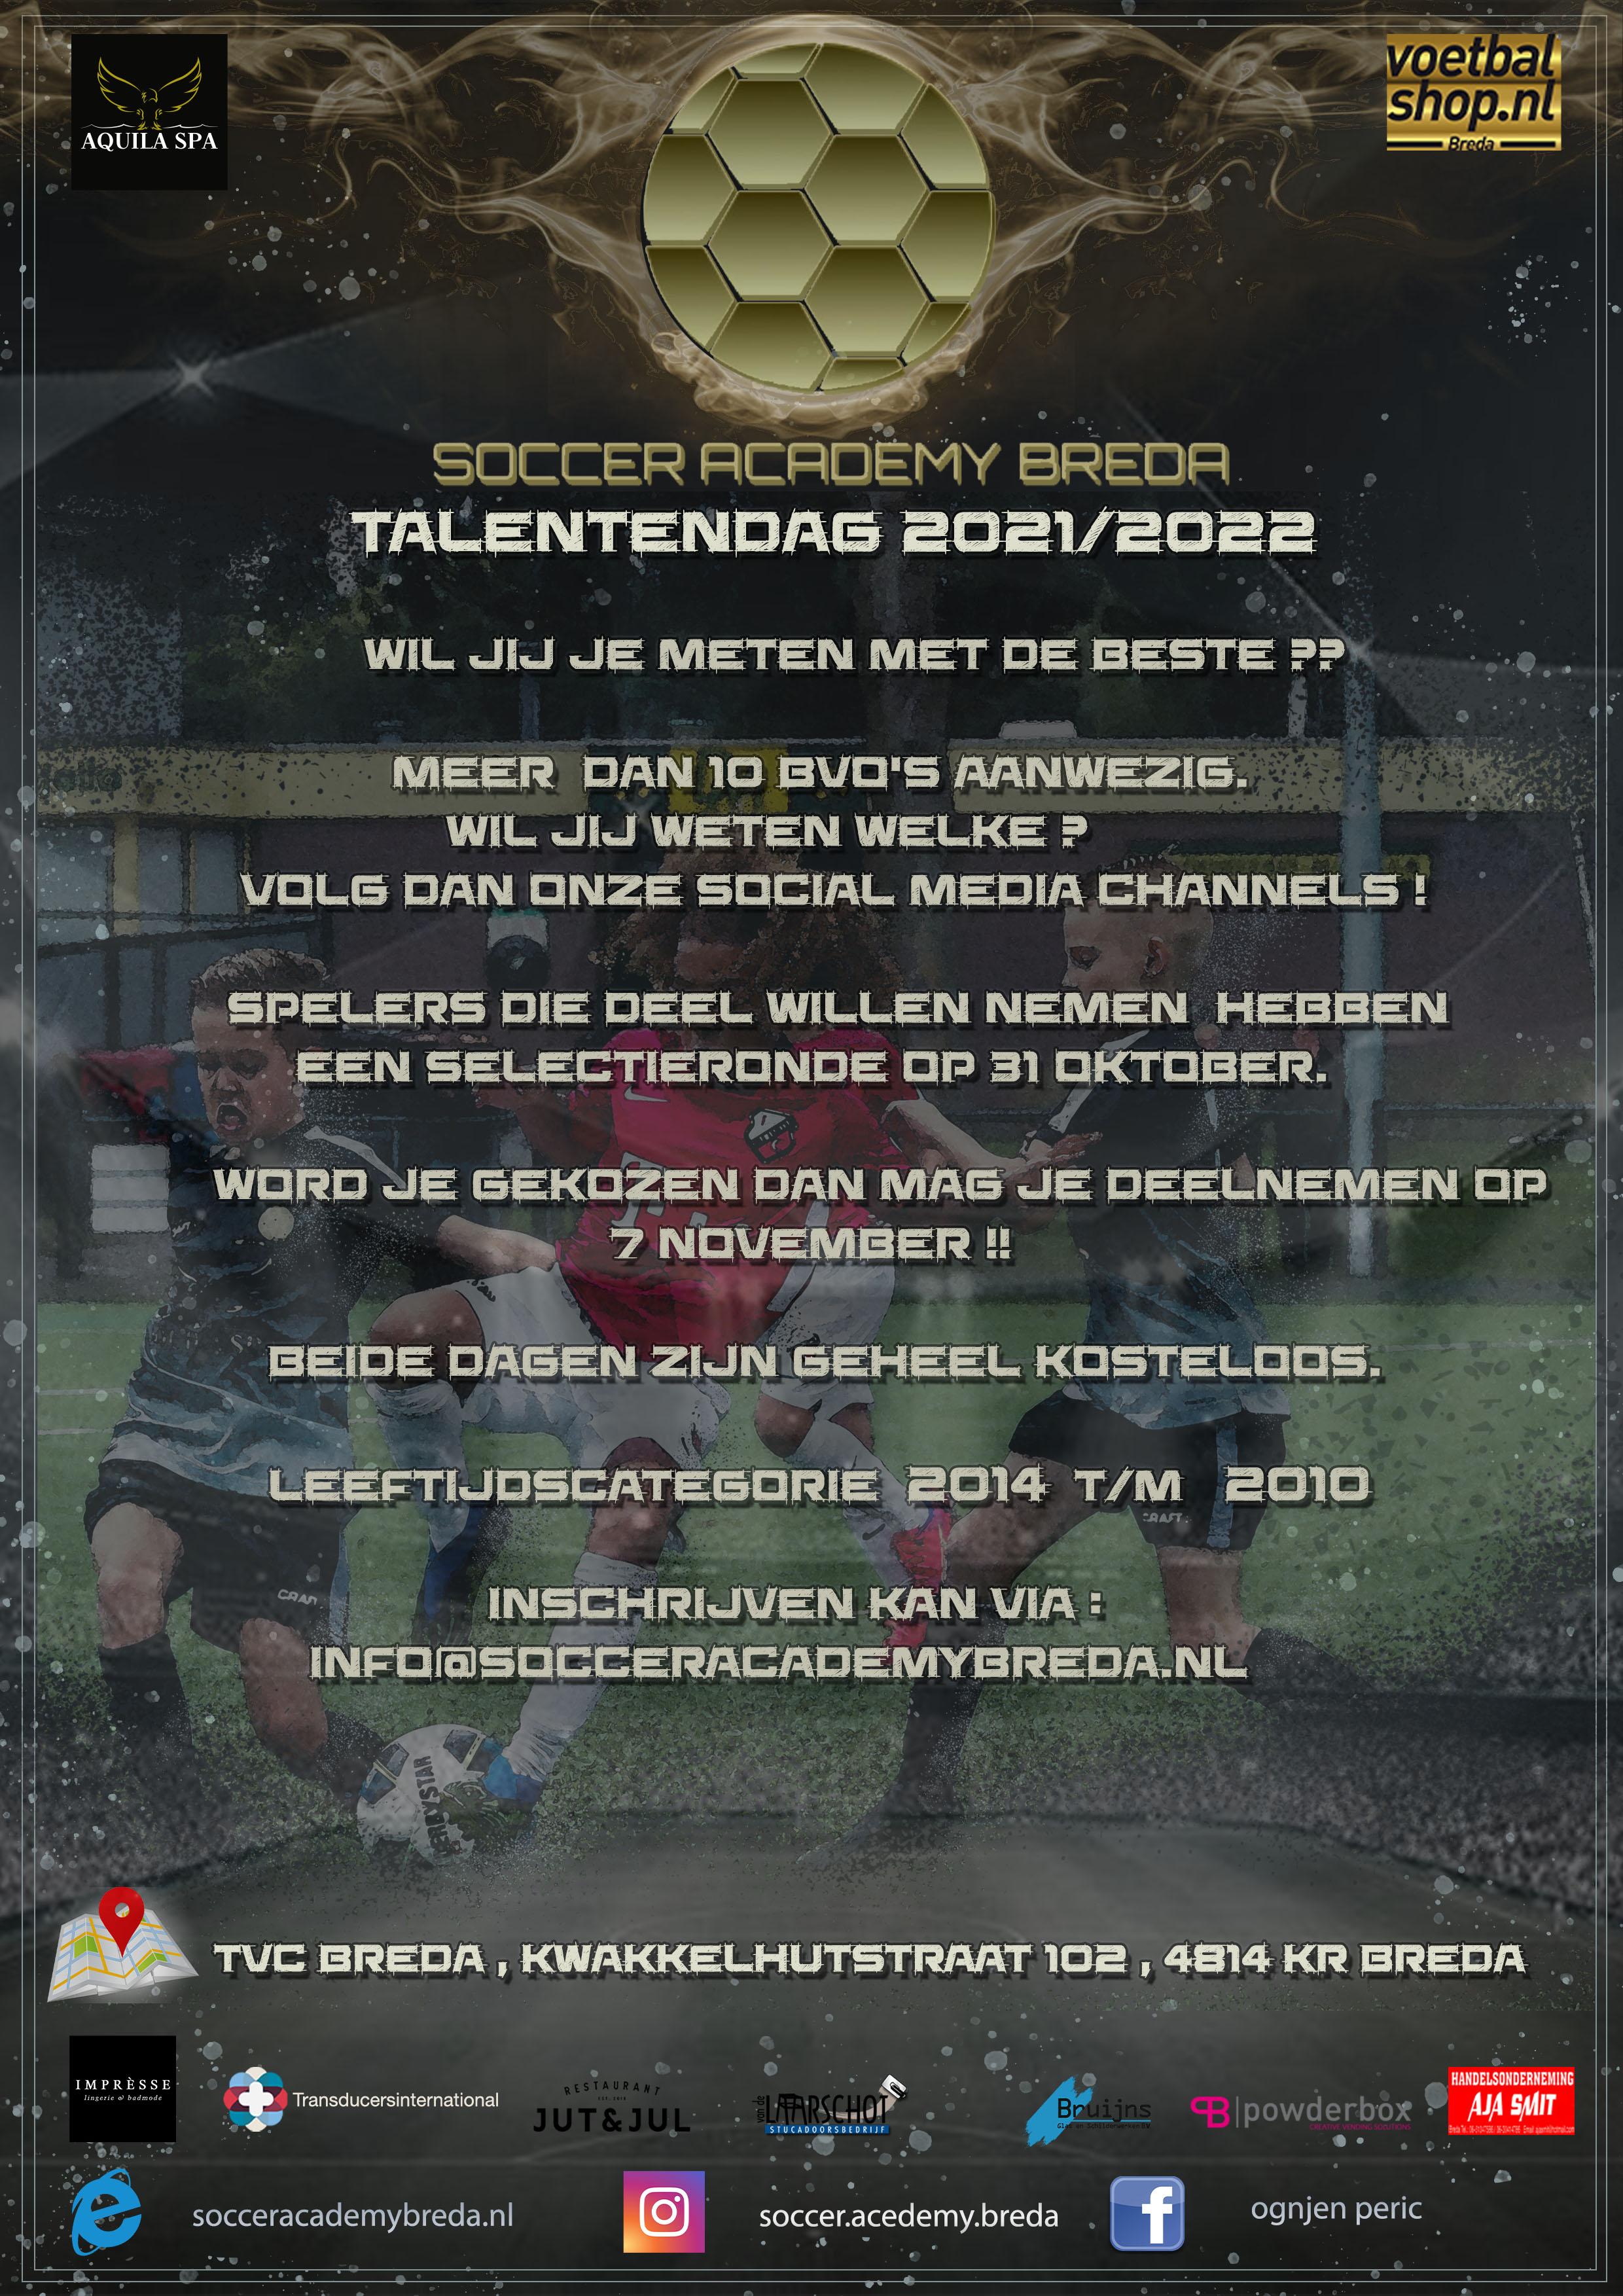 https://socceracademybreda.nl/wp-content/uploads/2021/09/talentendag-2021_2022.jpg